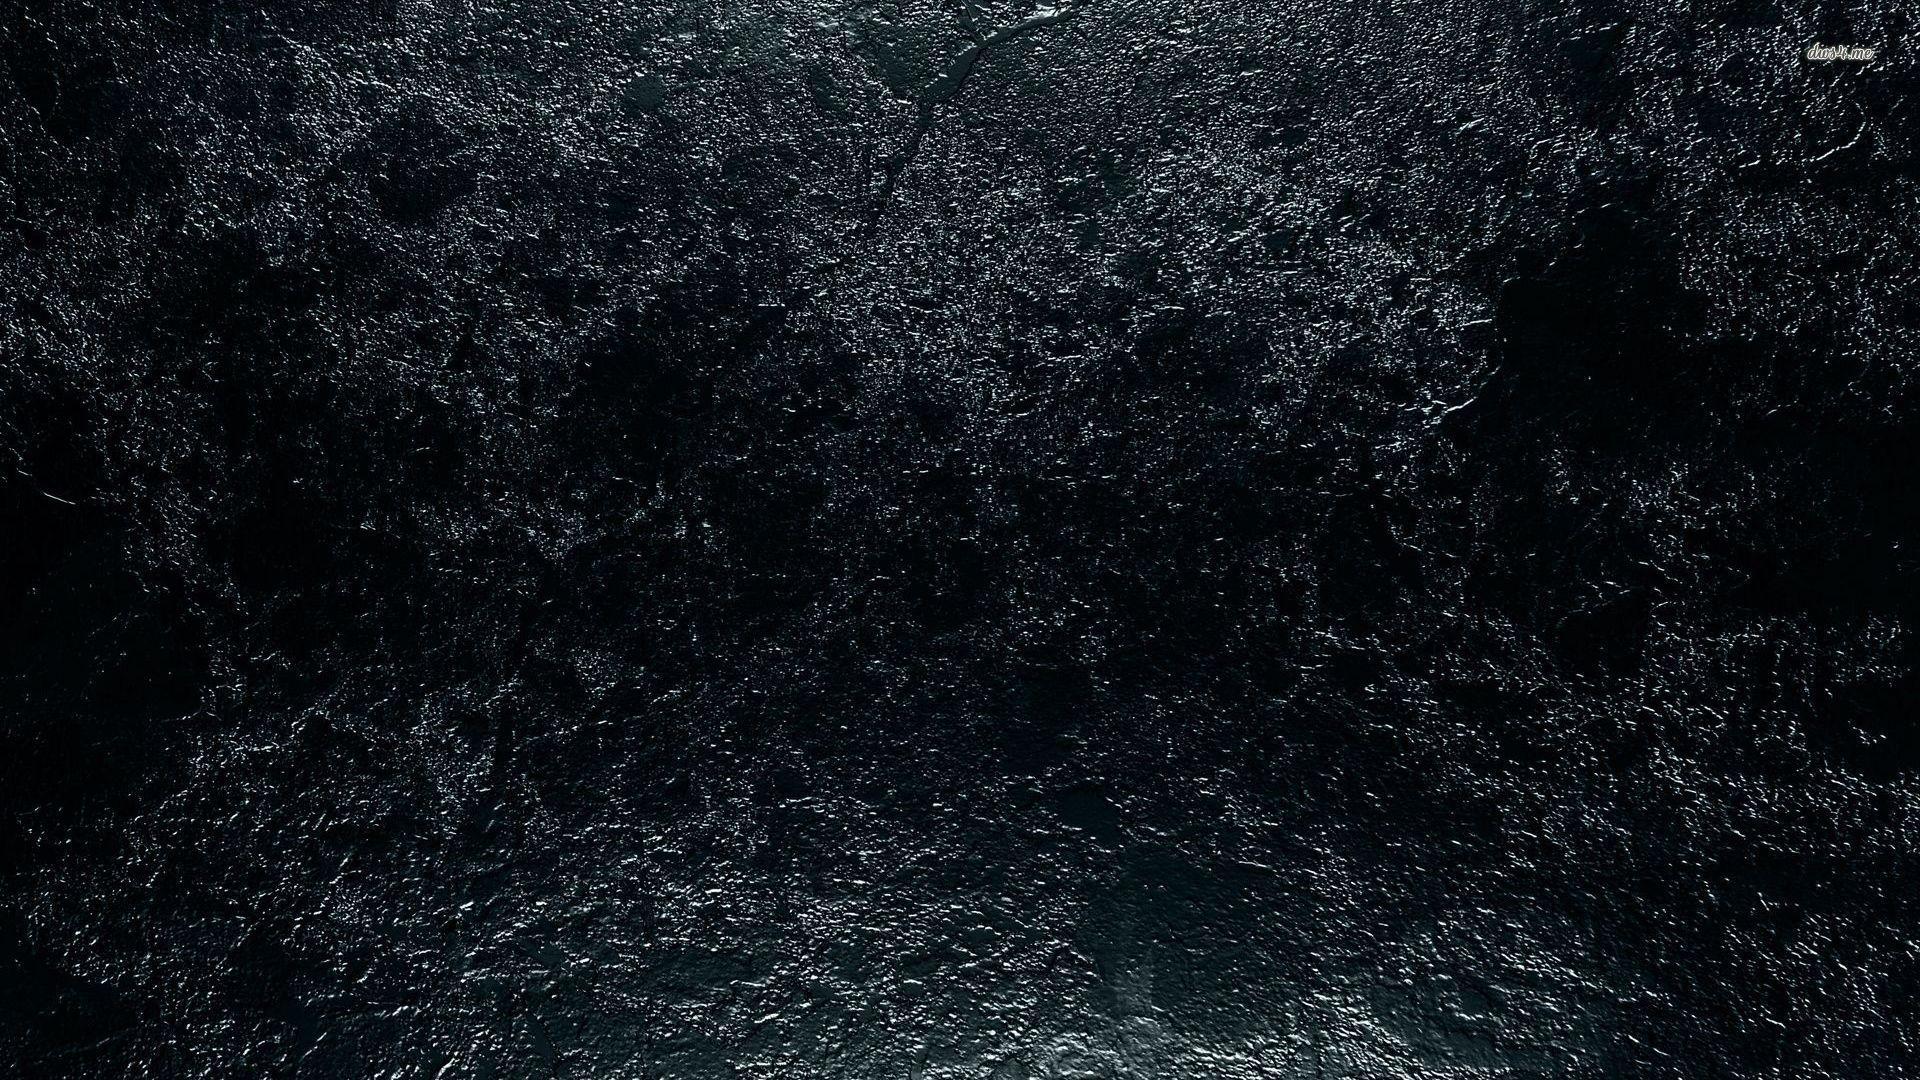 Black Texture Wallpaper Http Www Hdofwallpapers Com Black Texture 13367 Black Textured Wallpaper Marble Wallpaper Hd Metal Texture